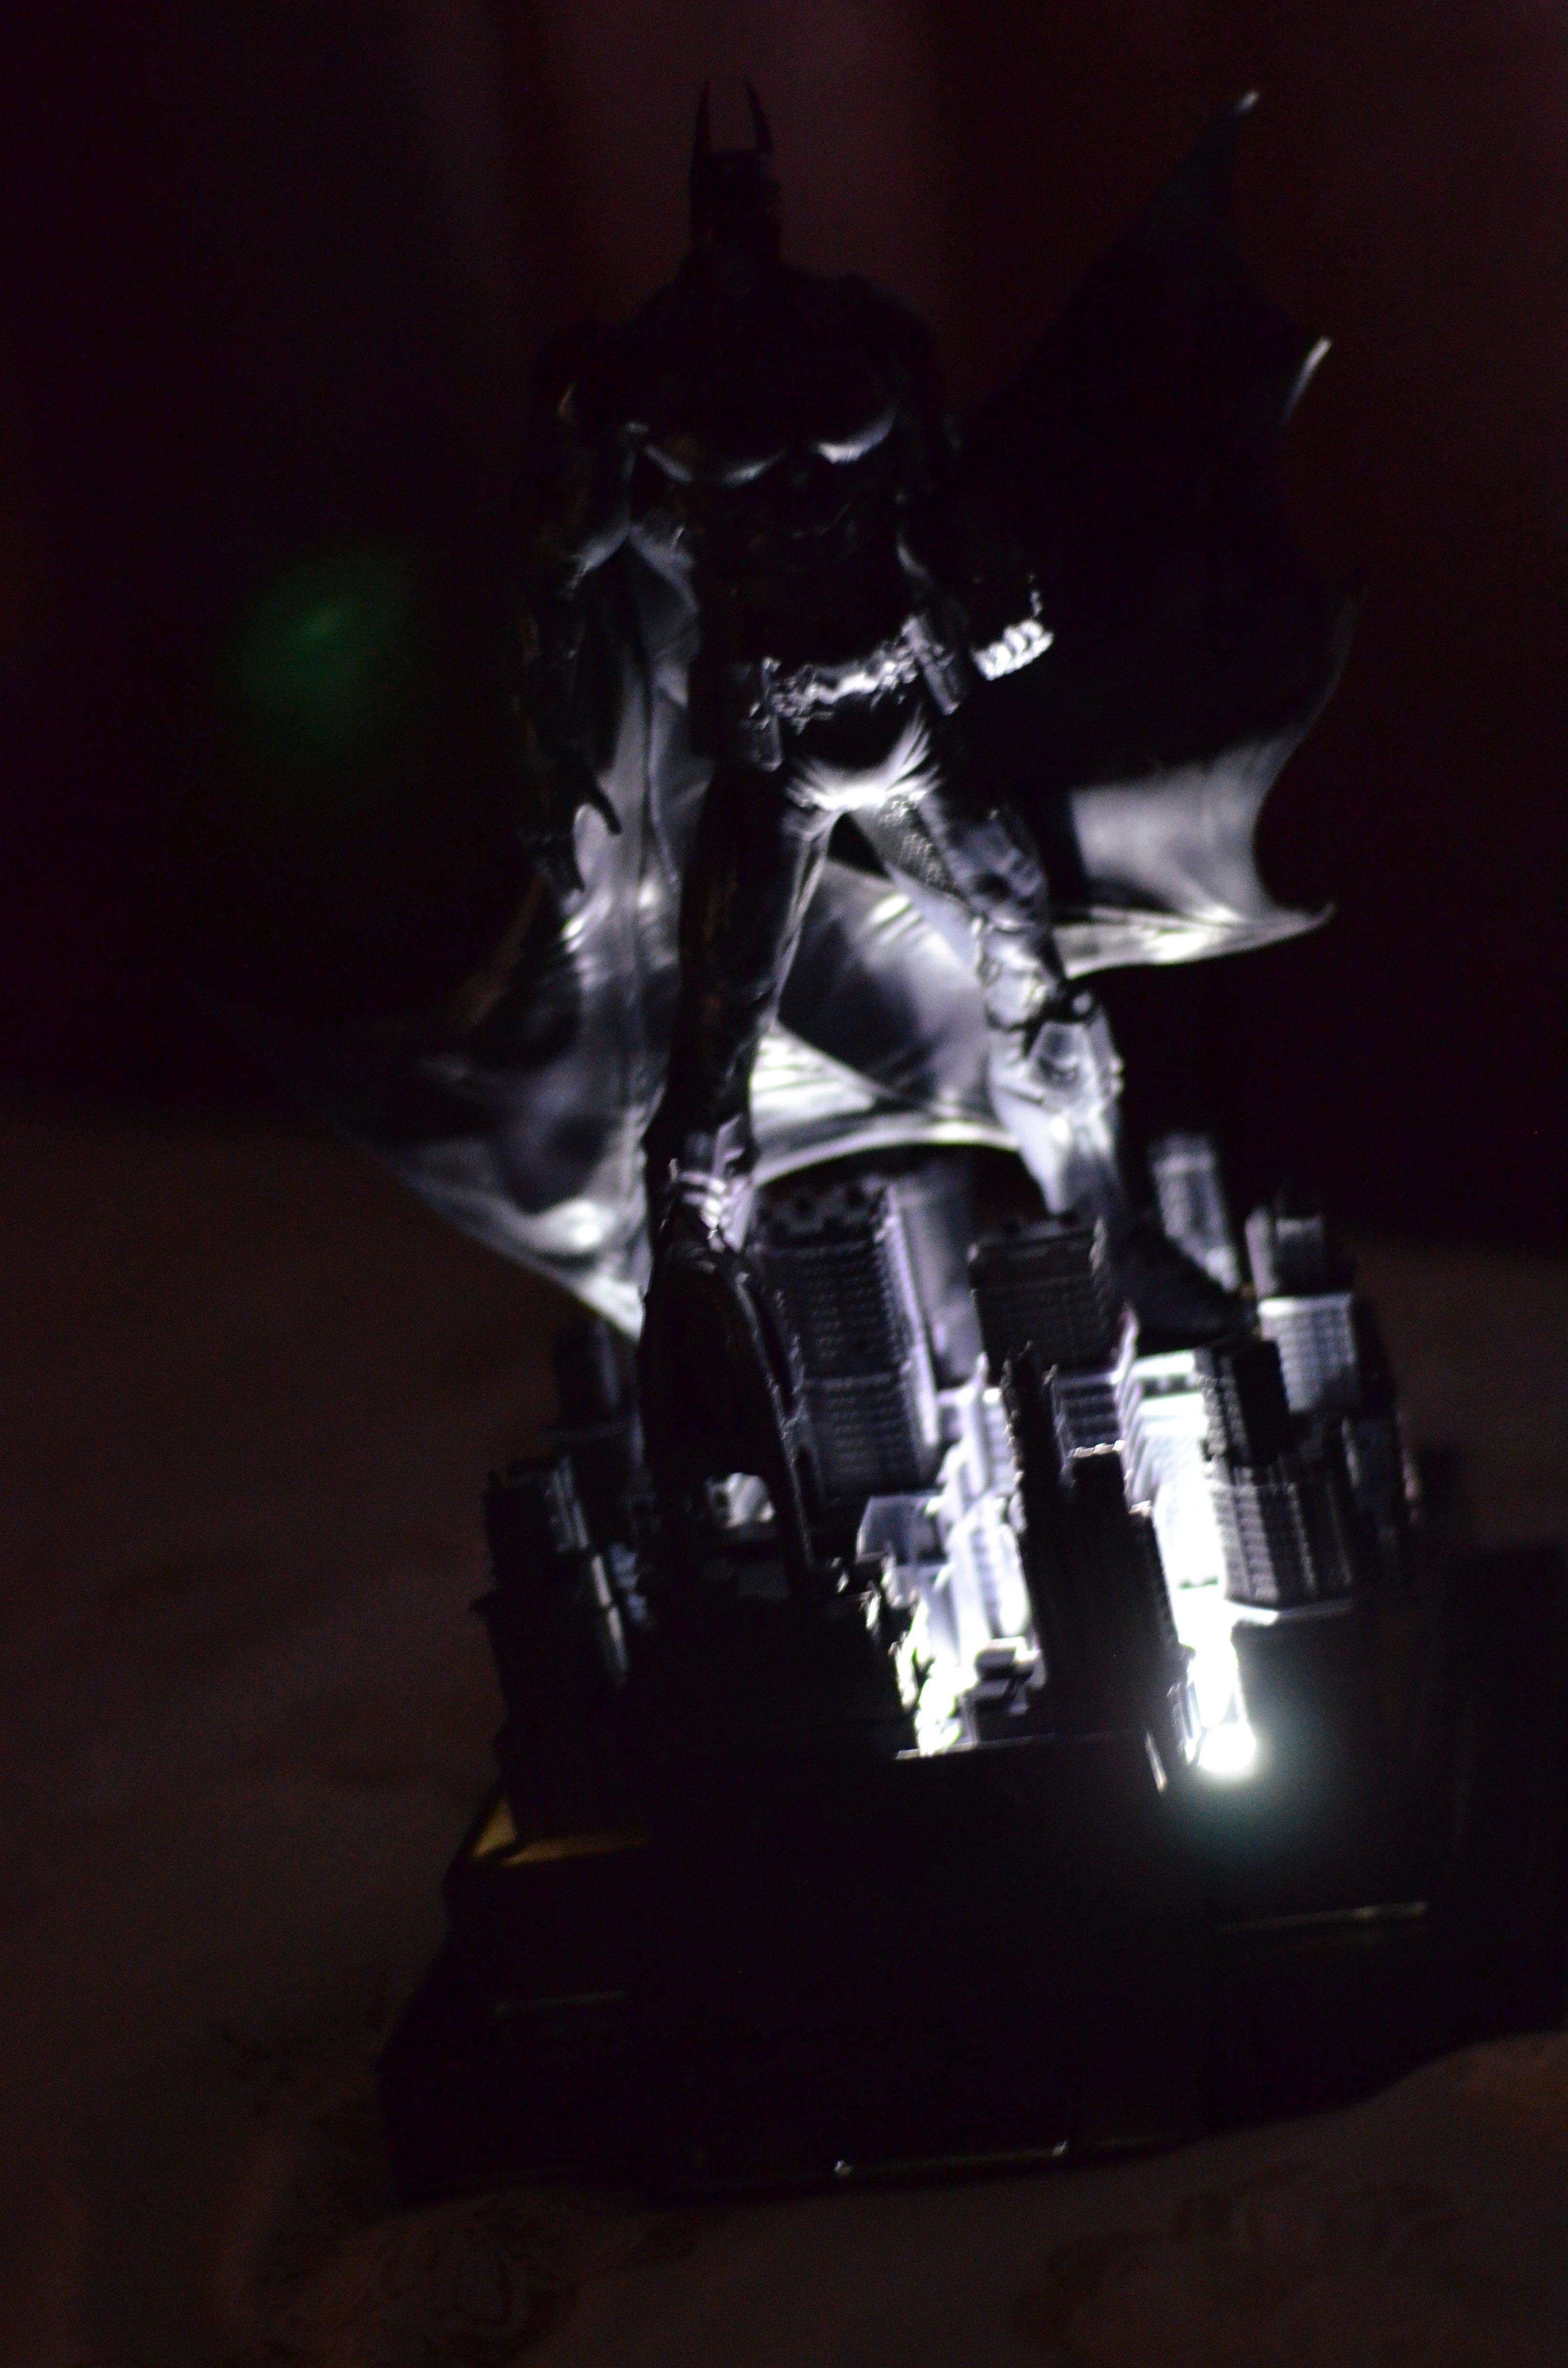 Анбоксинг Batman Arkham Knight limited edition (PS4) - Изображение 38